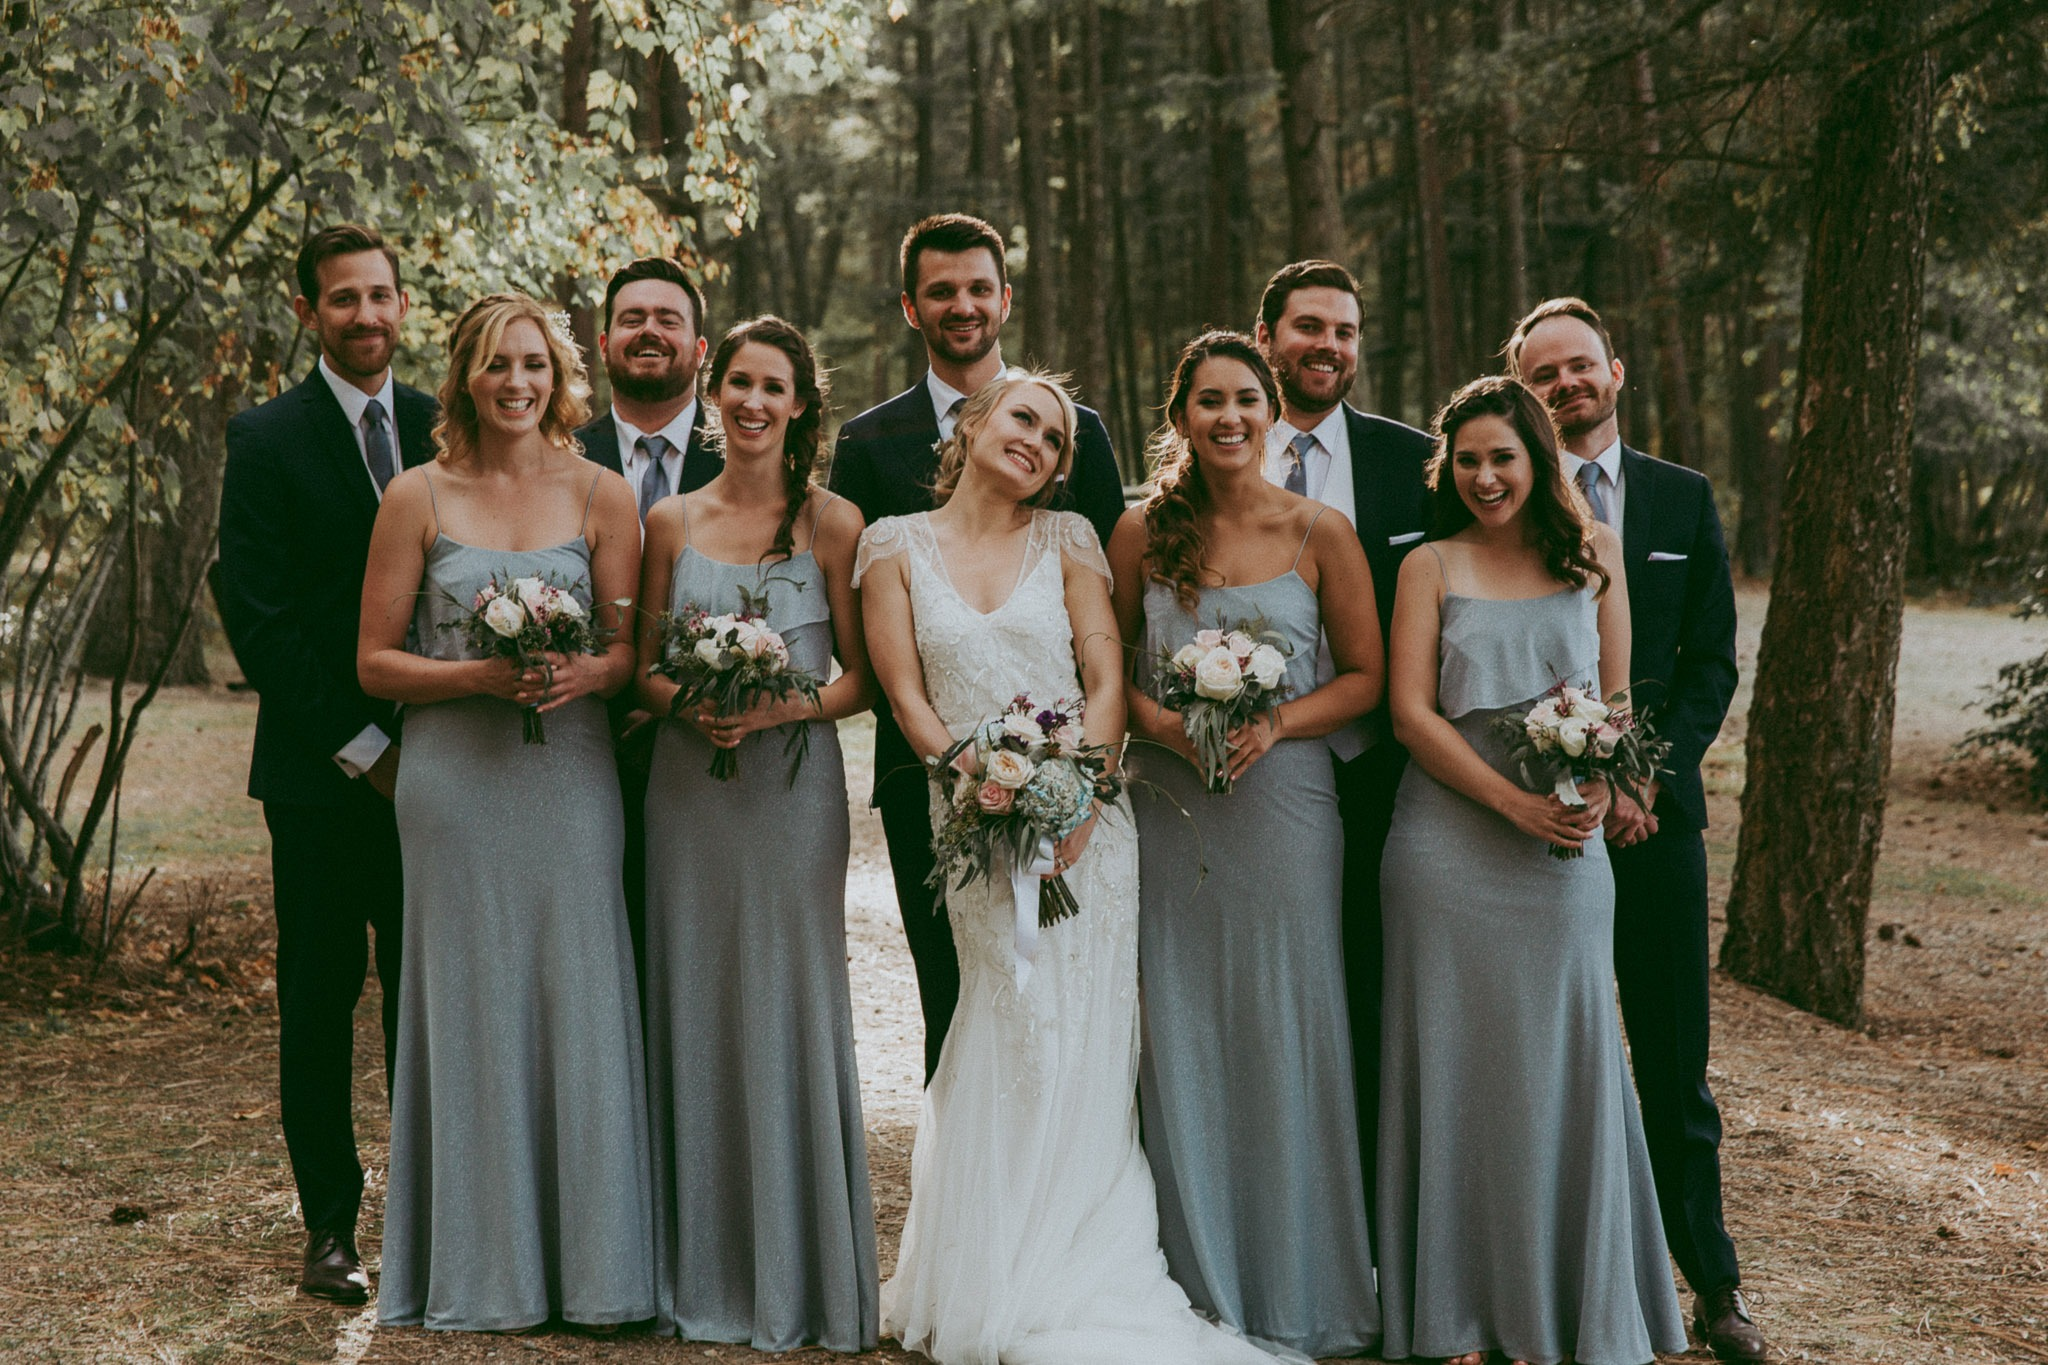 Kari edgren wedding